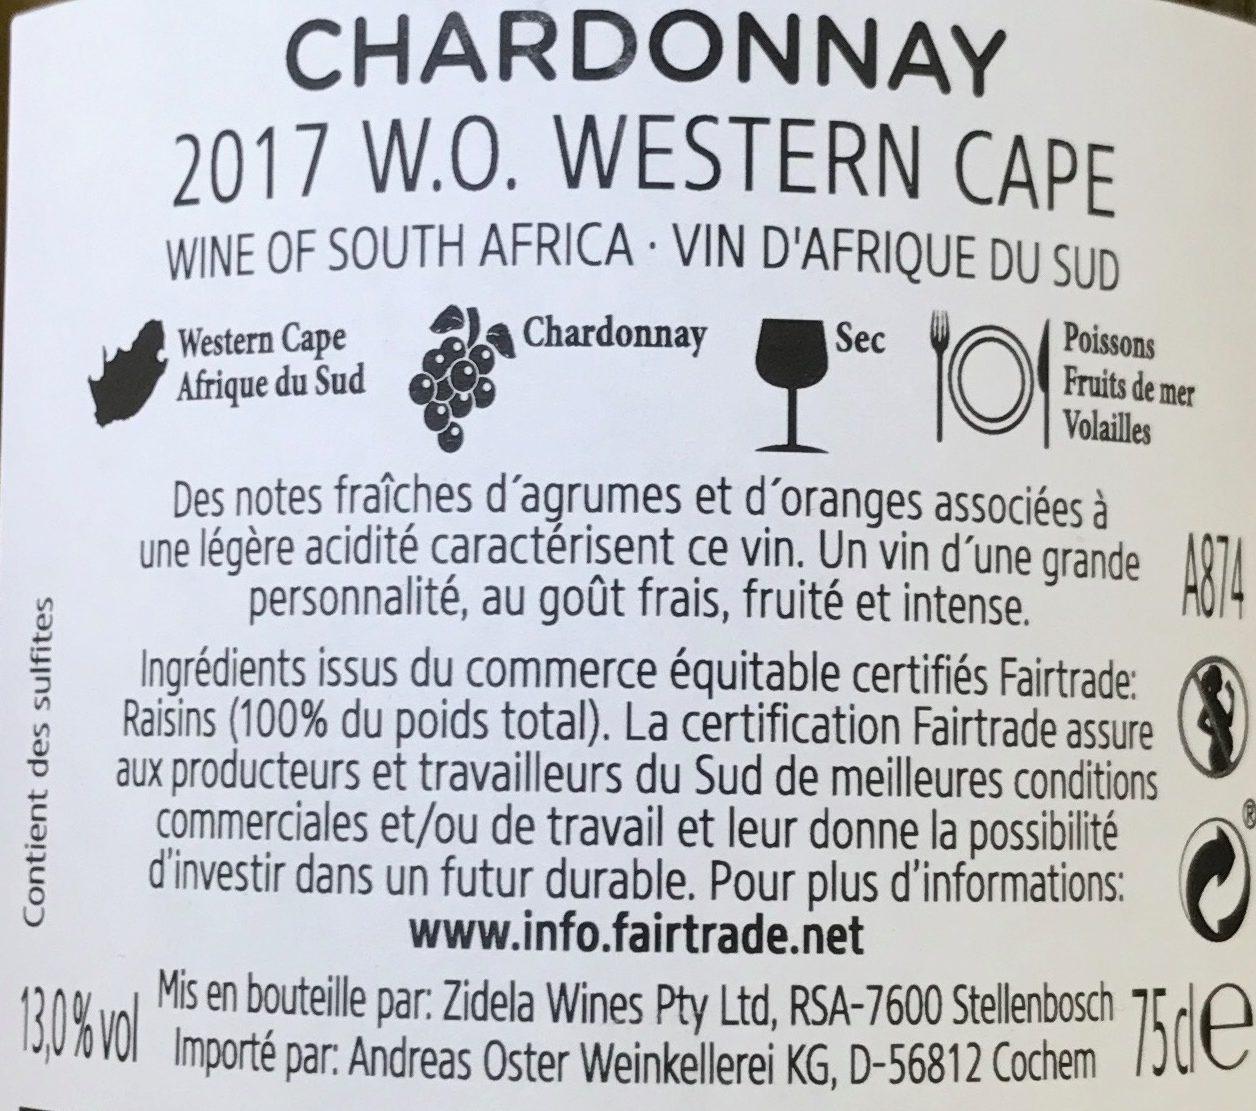 2017 Chardonnay Afrique du Sud - Ingredients